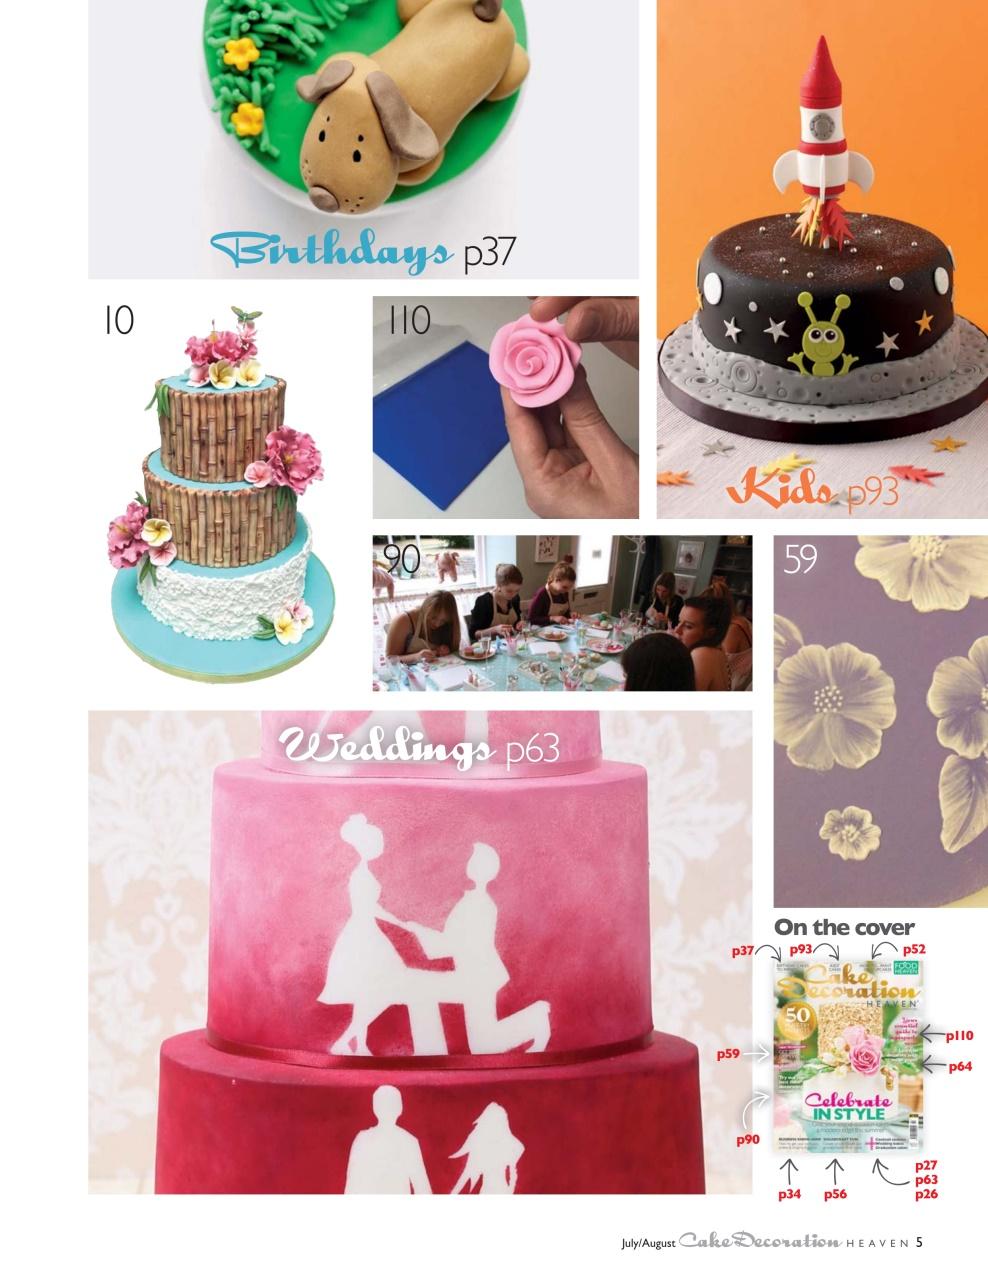 Cake Decorating Heaven Menai : Cake Decorating Heaven July/August 2016 Pocketmags.com